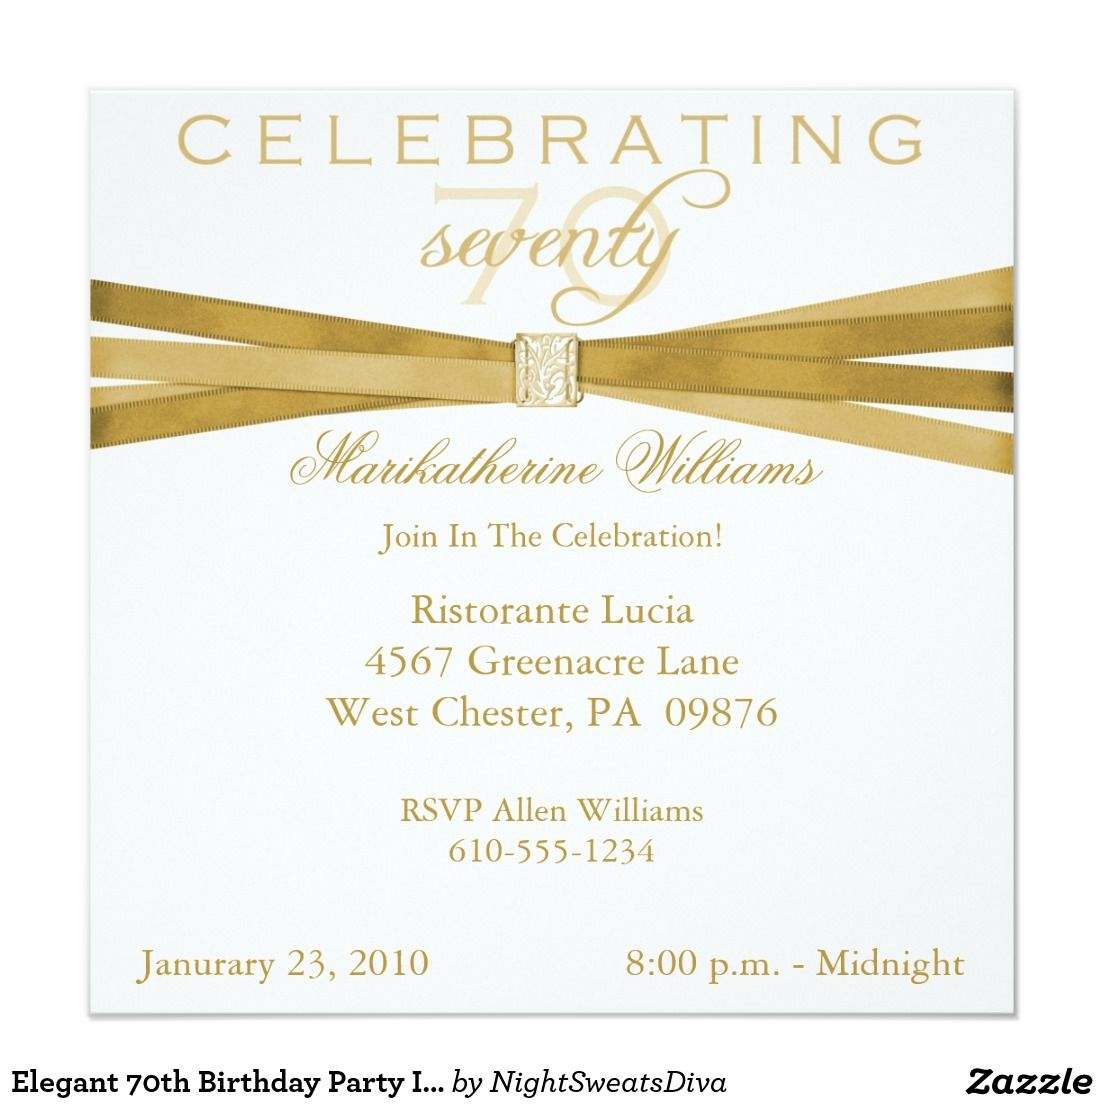 Elegant 70th Birthday Party Invitations | 70 birthday parties, 70 ...